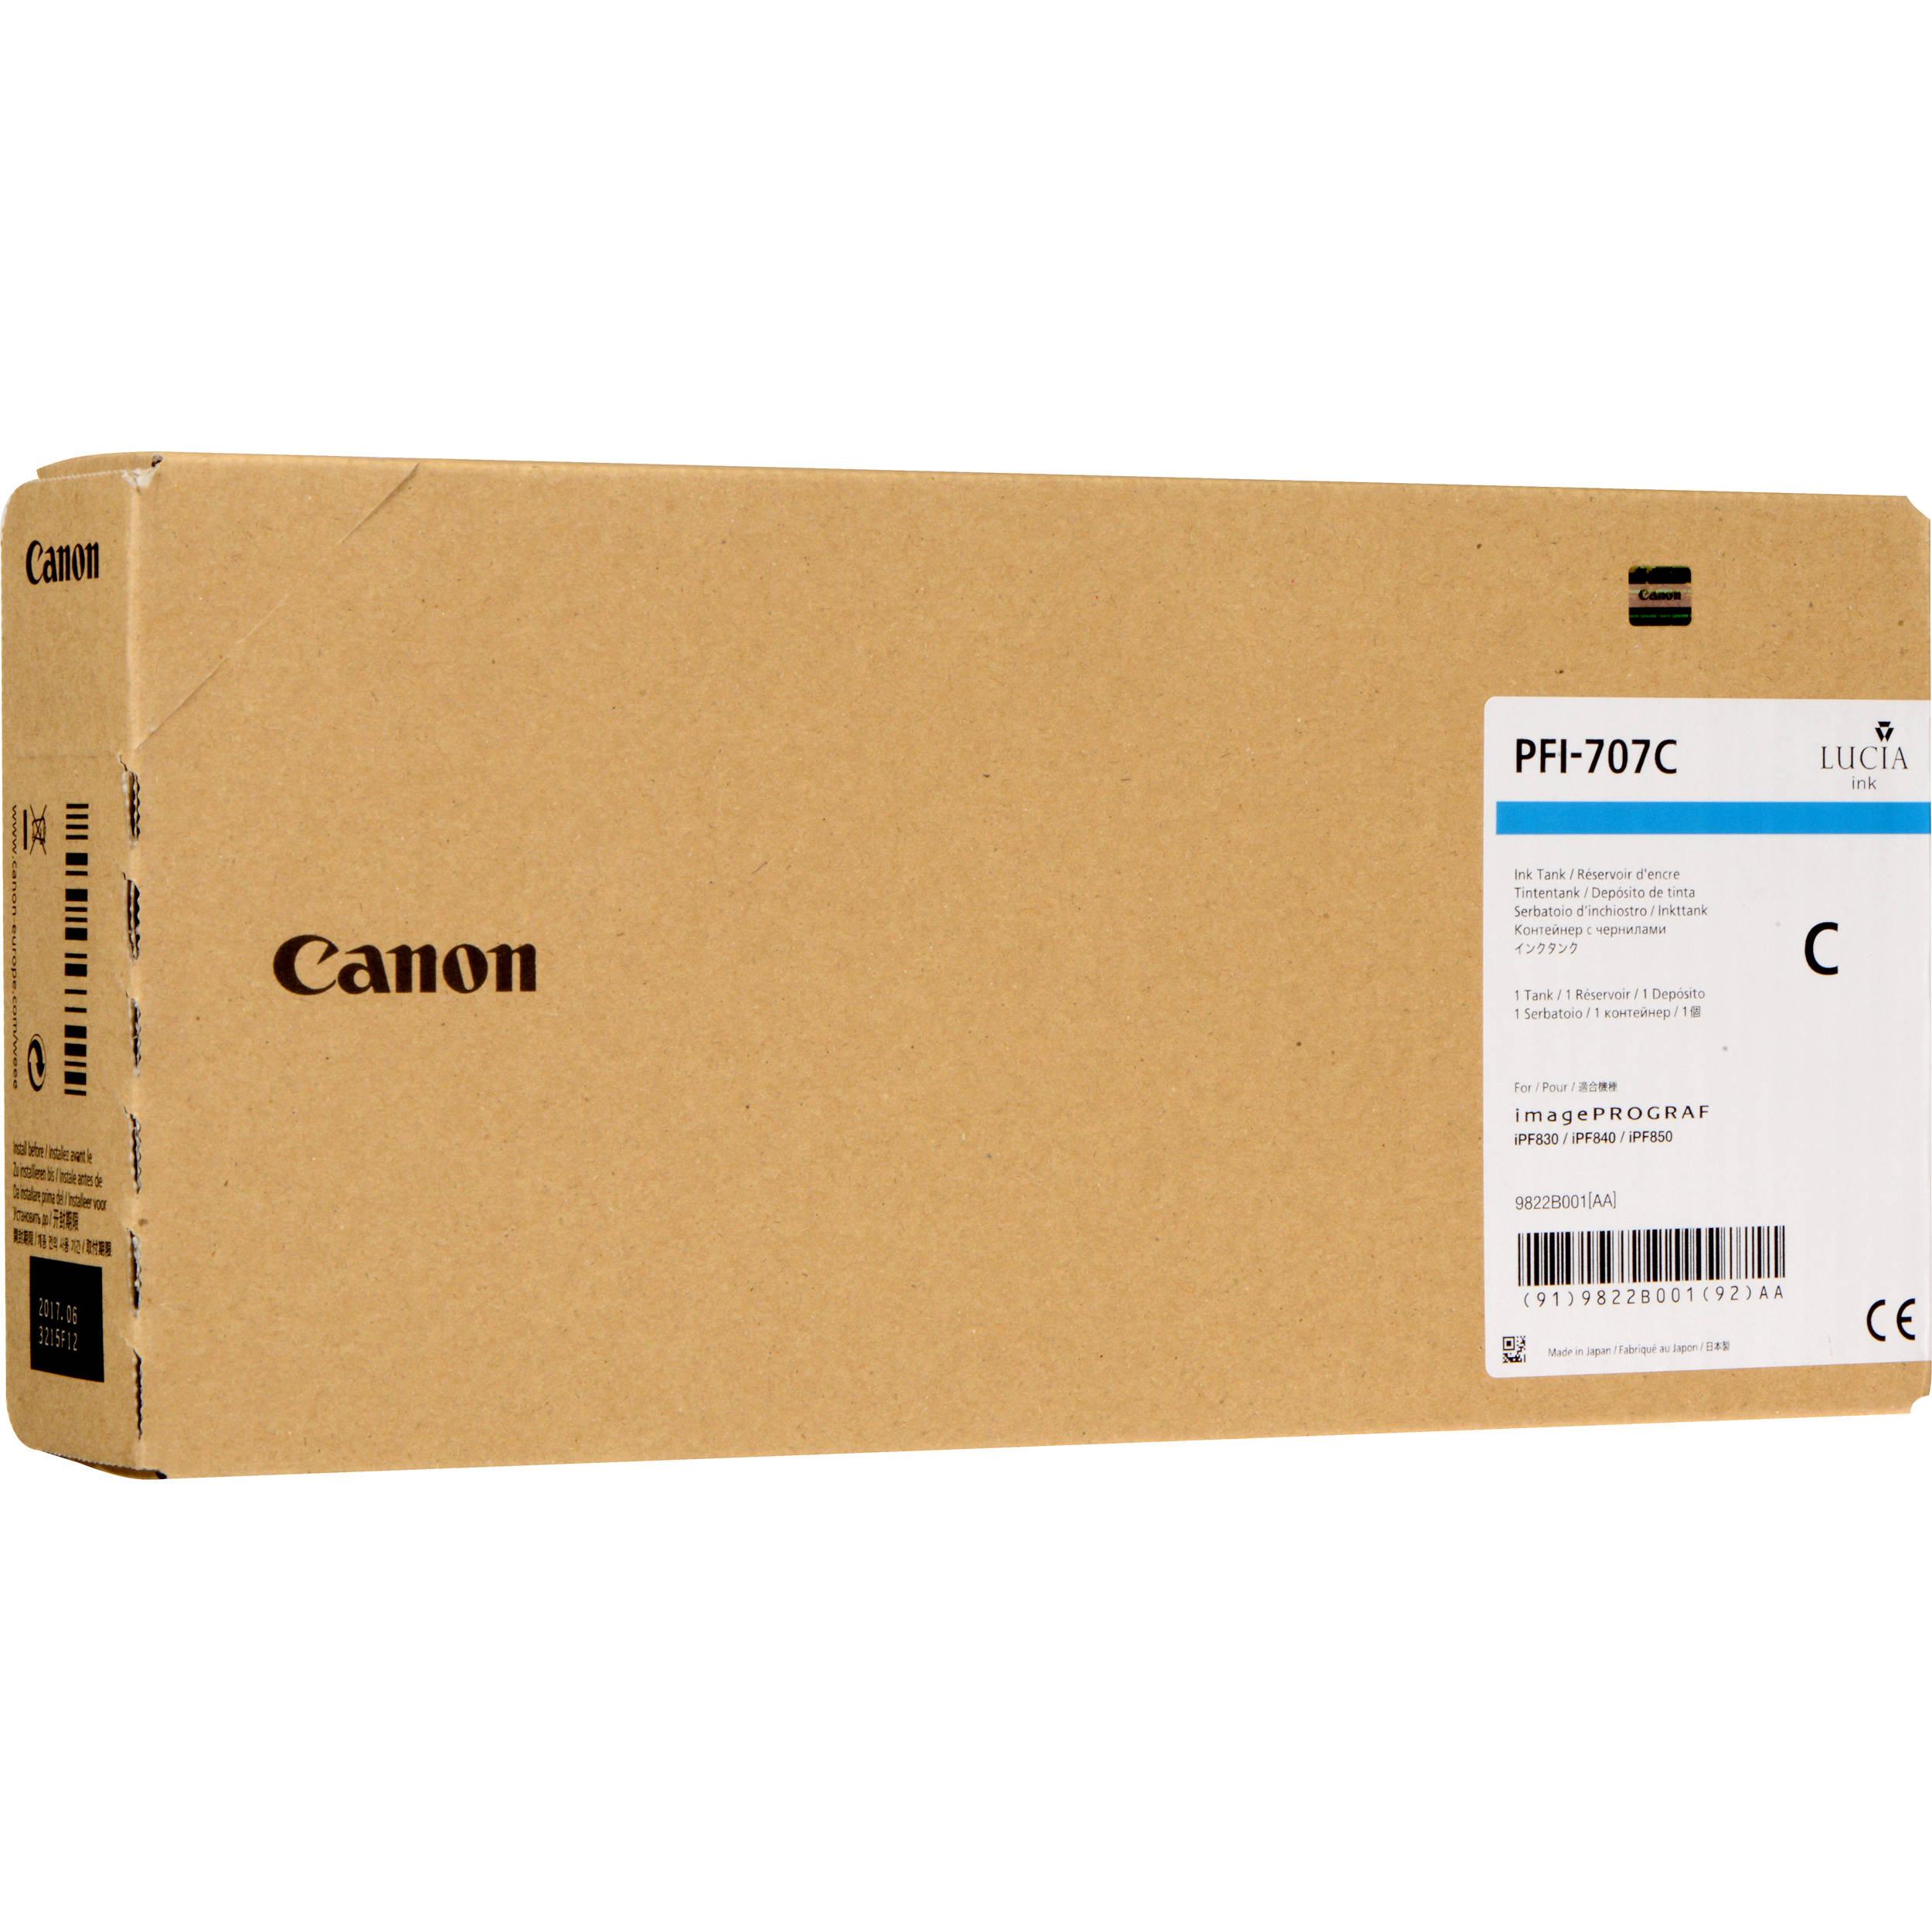 Cartus Inkjet Canon PFI-707C Cyan 700ml